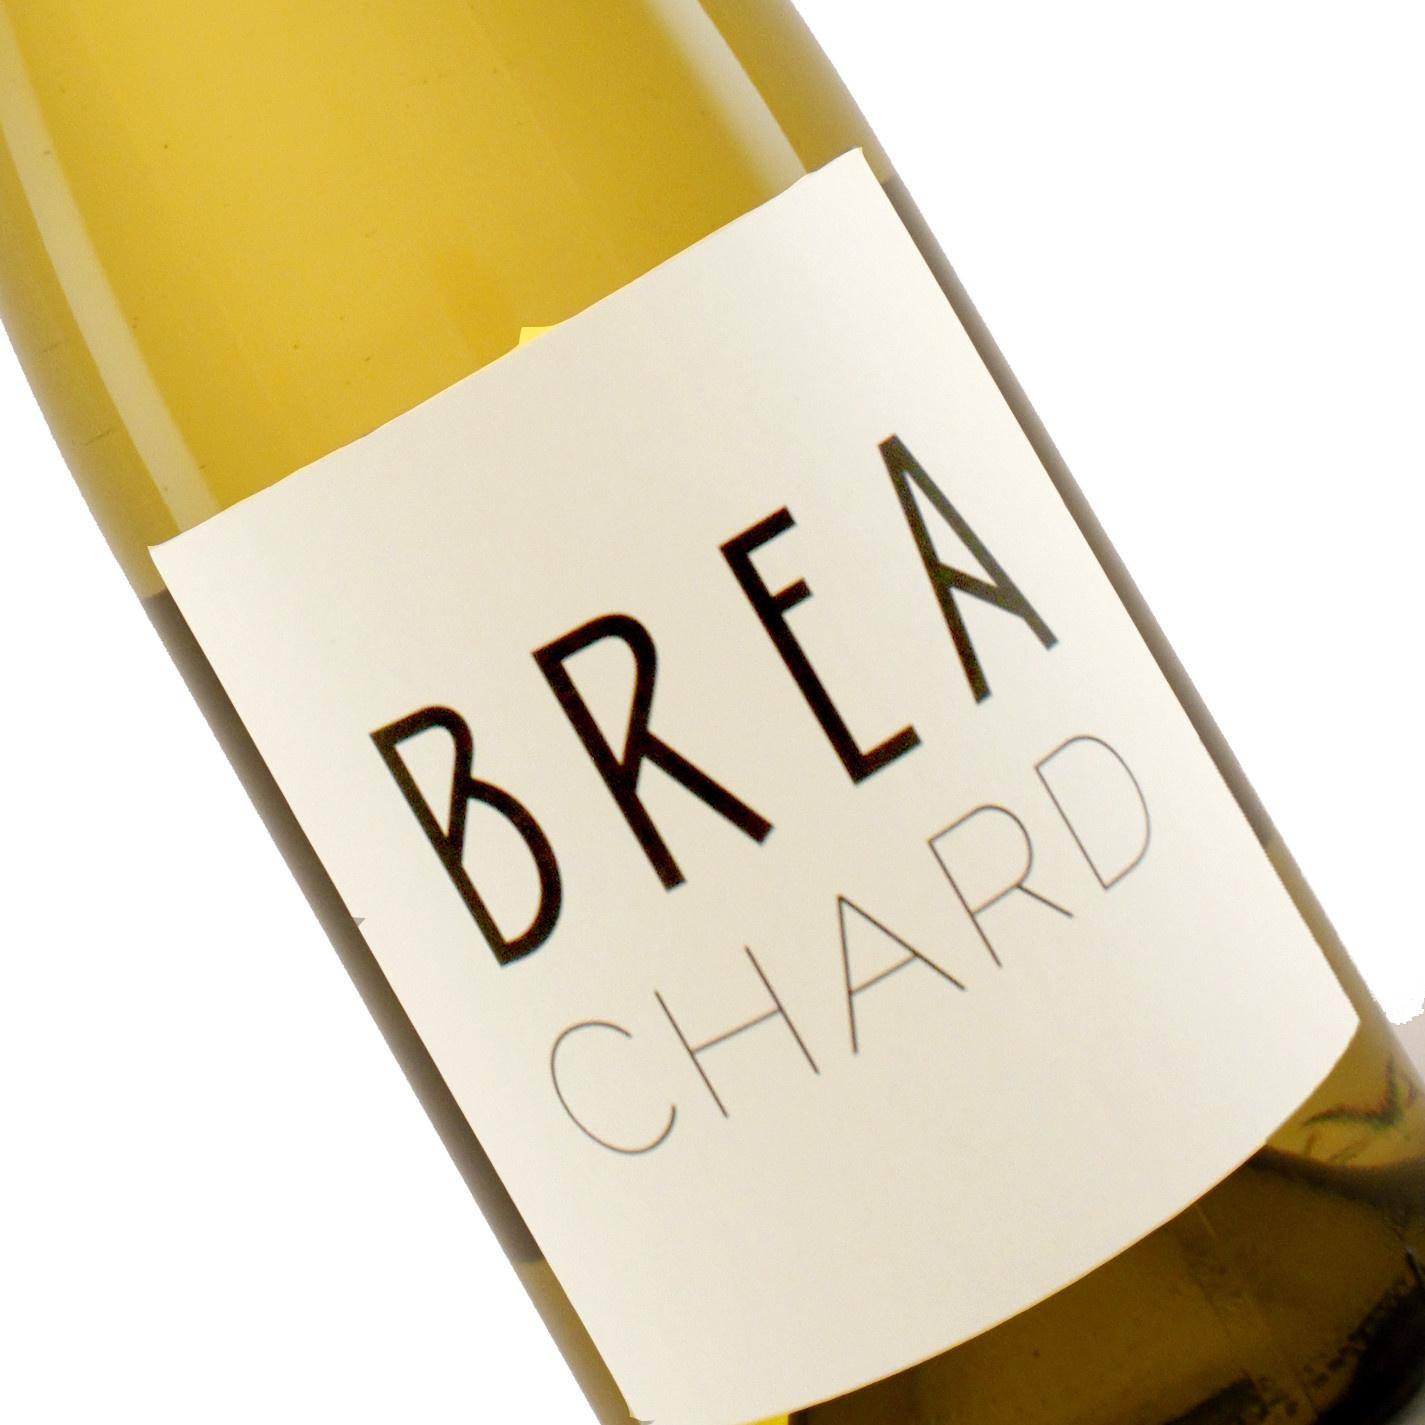 Brea 2018 Chardonnay Santa Lucia Highlands